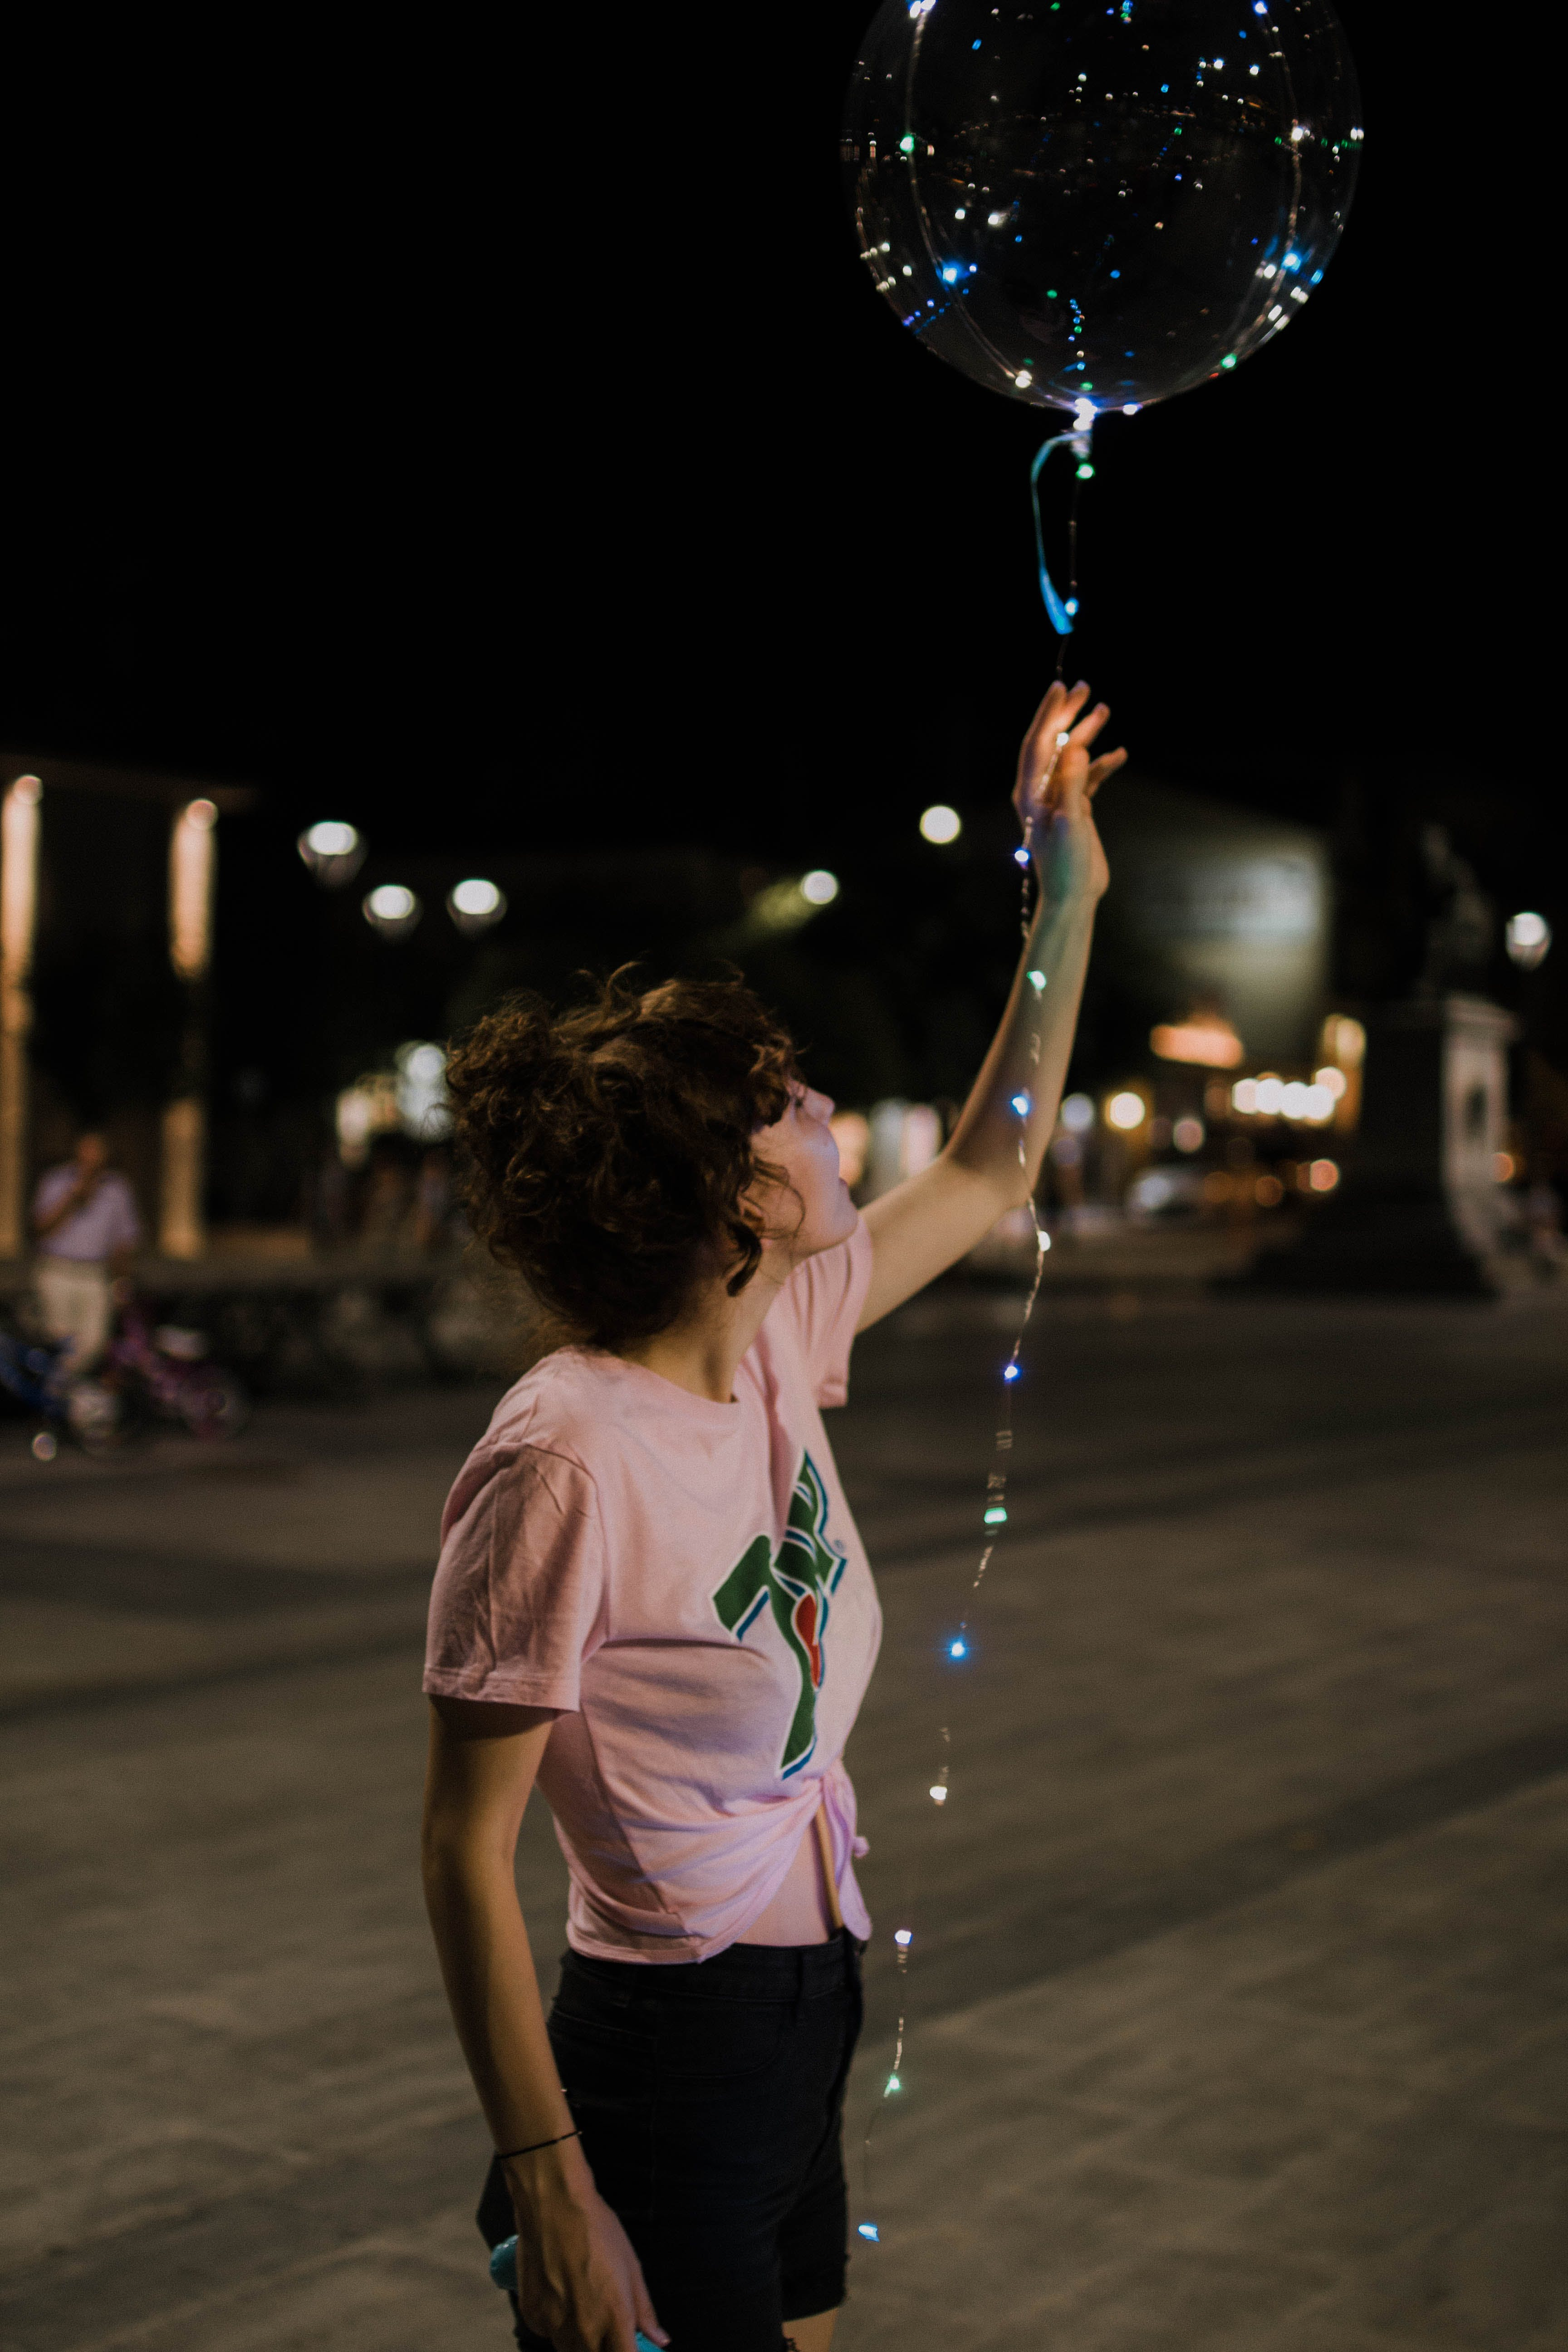 Kostenloses Stock Foto zu ballon, beleuchtung, frau, person